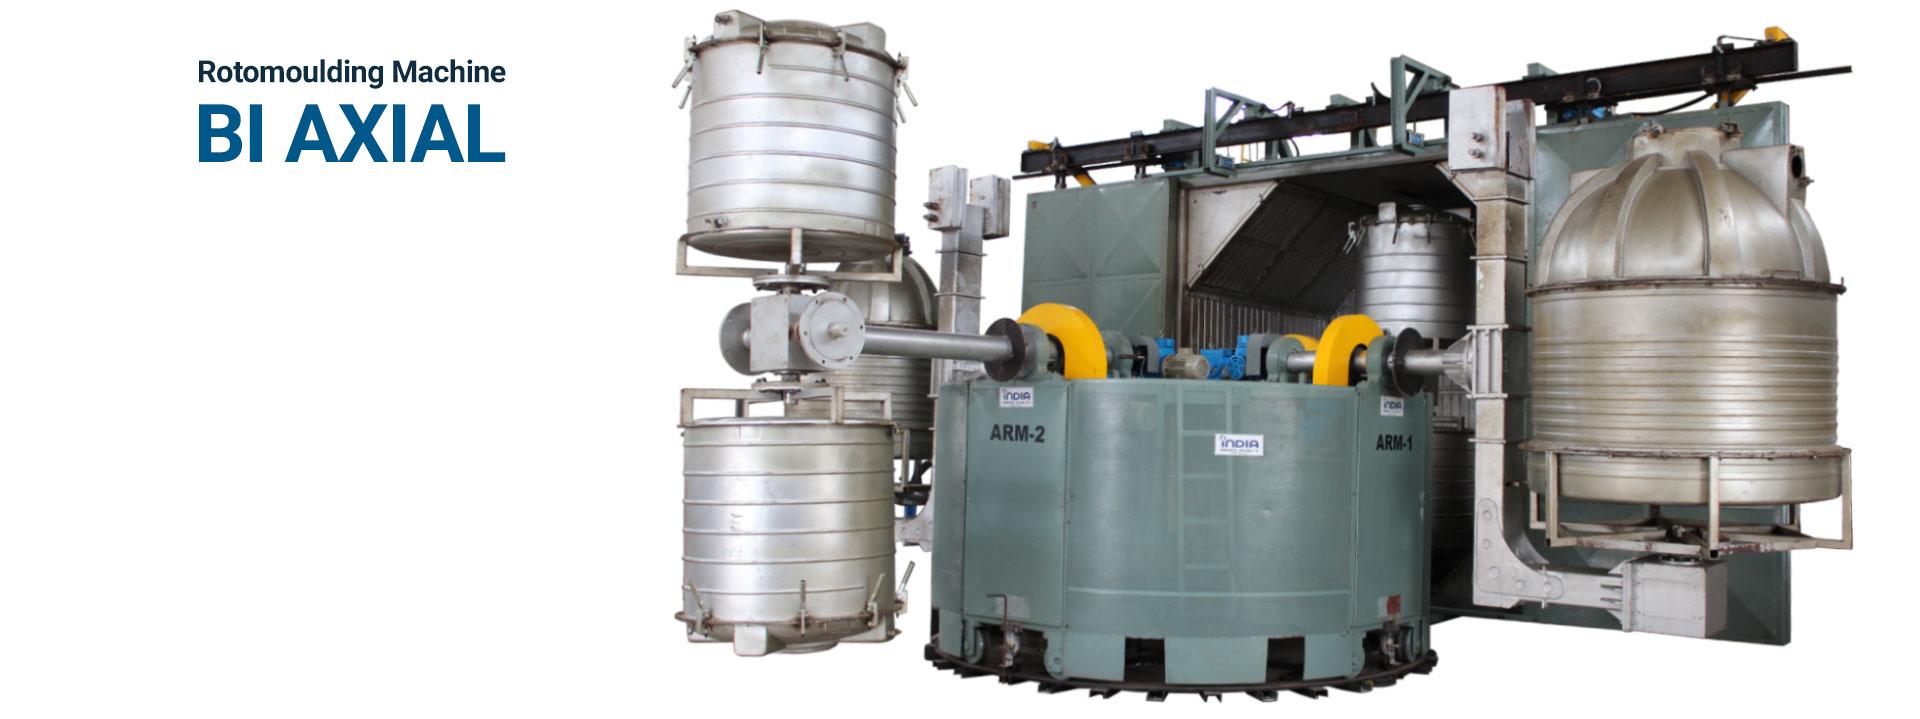 Bi Axial Rotomoulding Machine Manuafcturer & Exporter in IndiaBi Axial Rotomoulding Machine